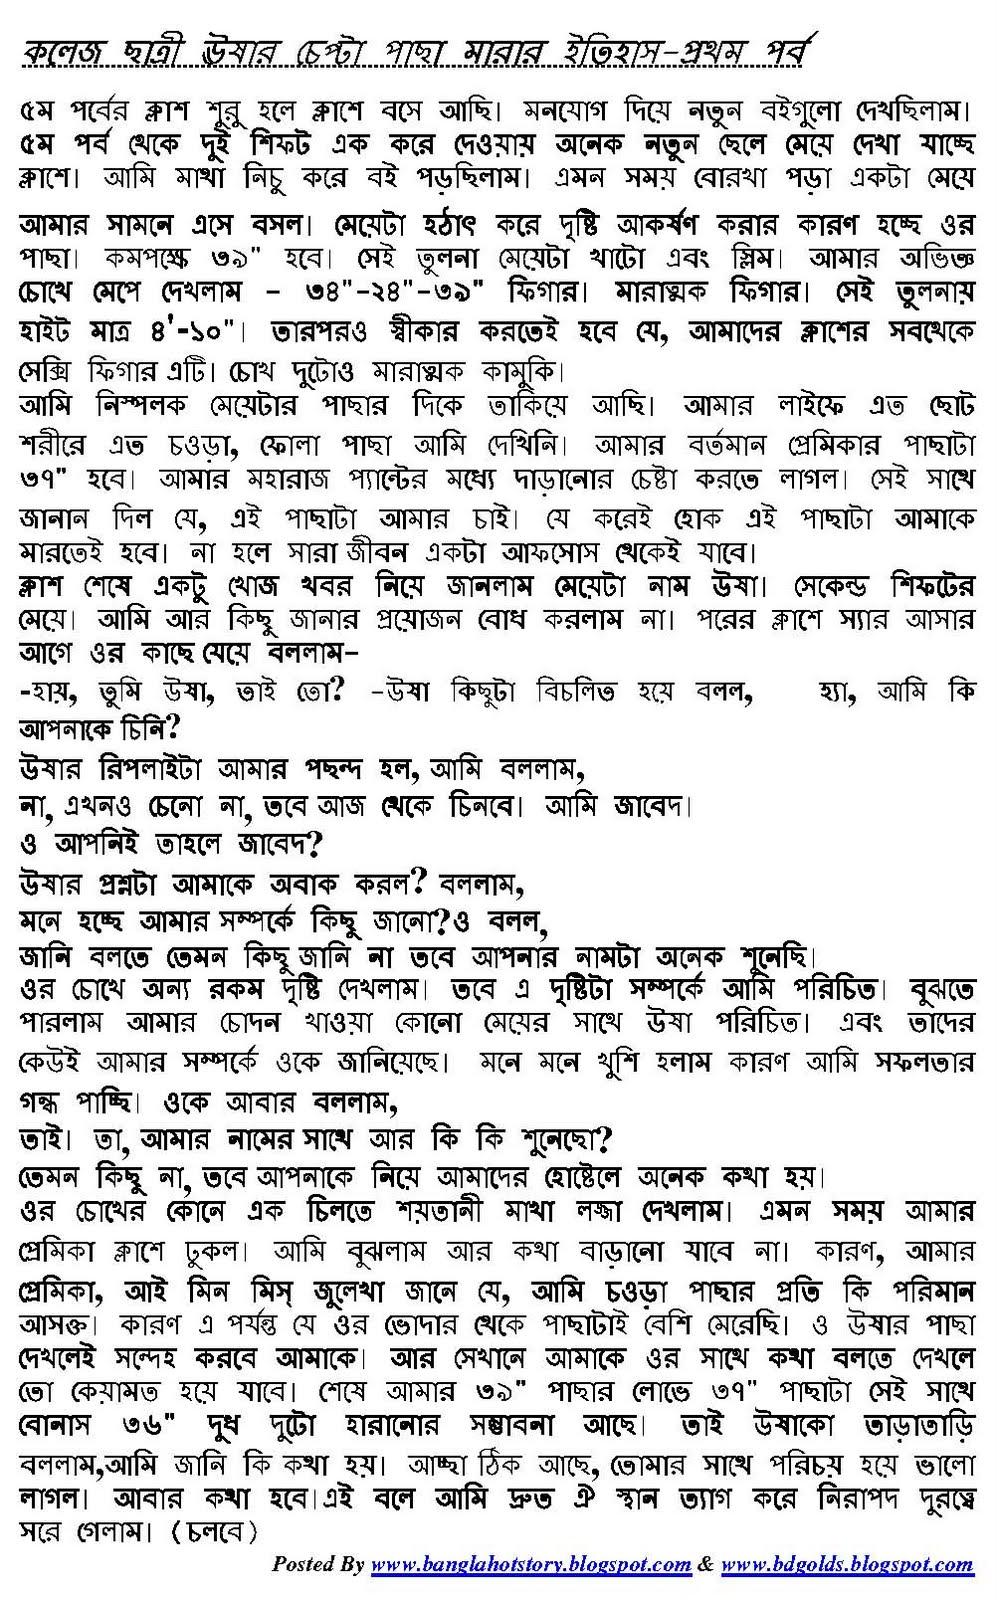 Bangla panu golpo in pdf free download by holcentmerkti issuu.